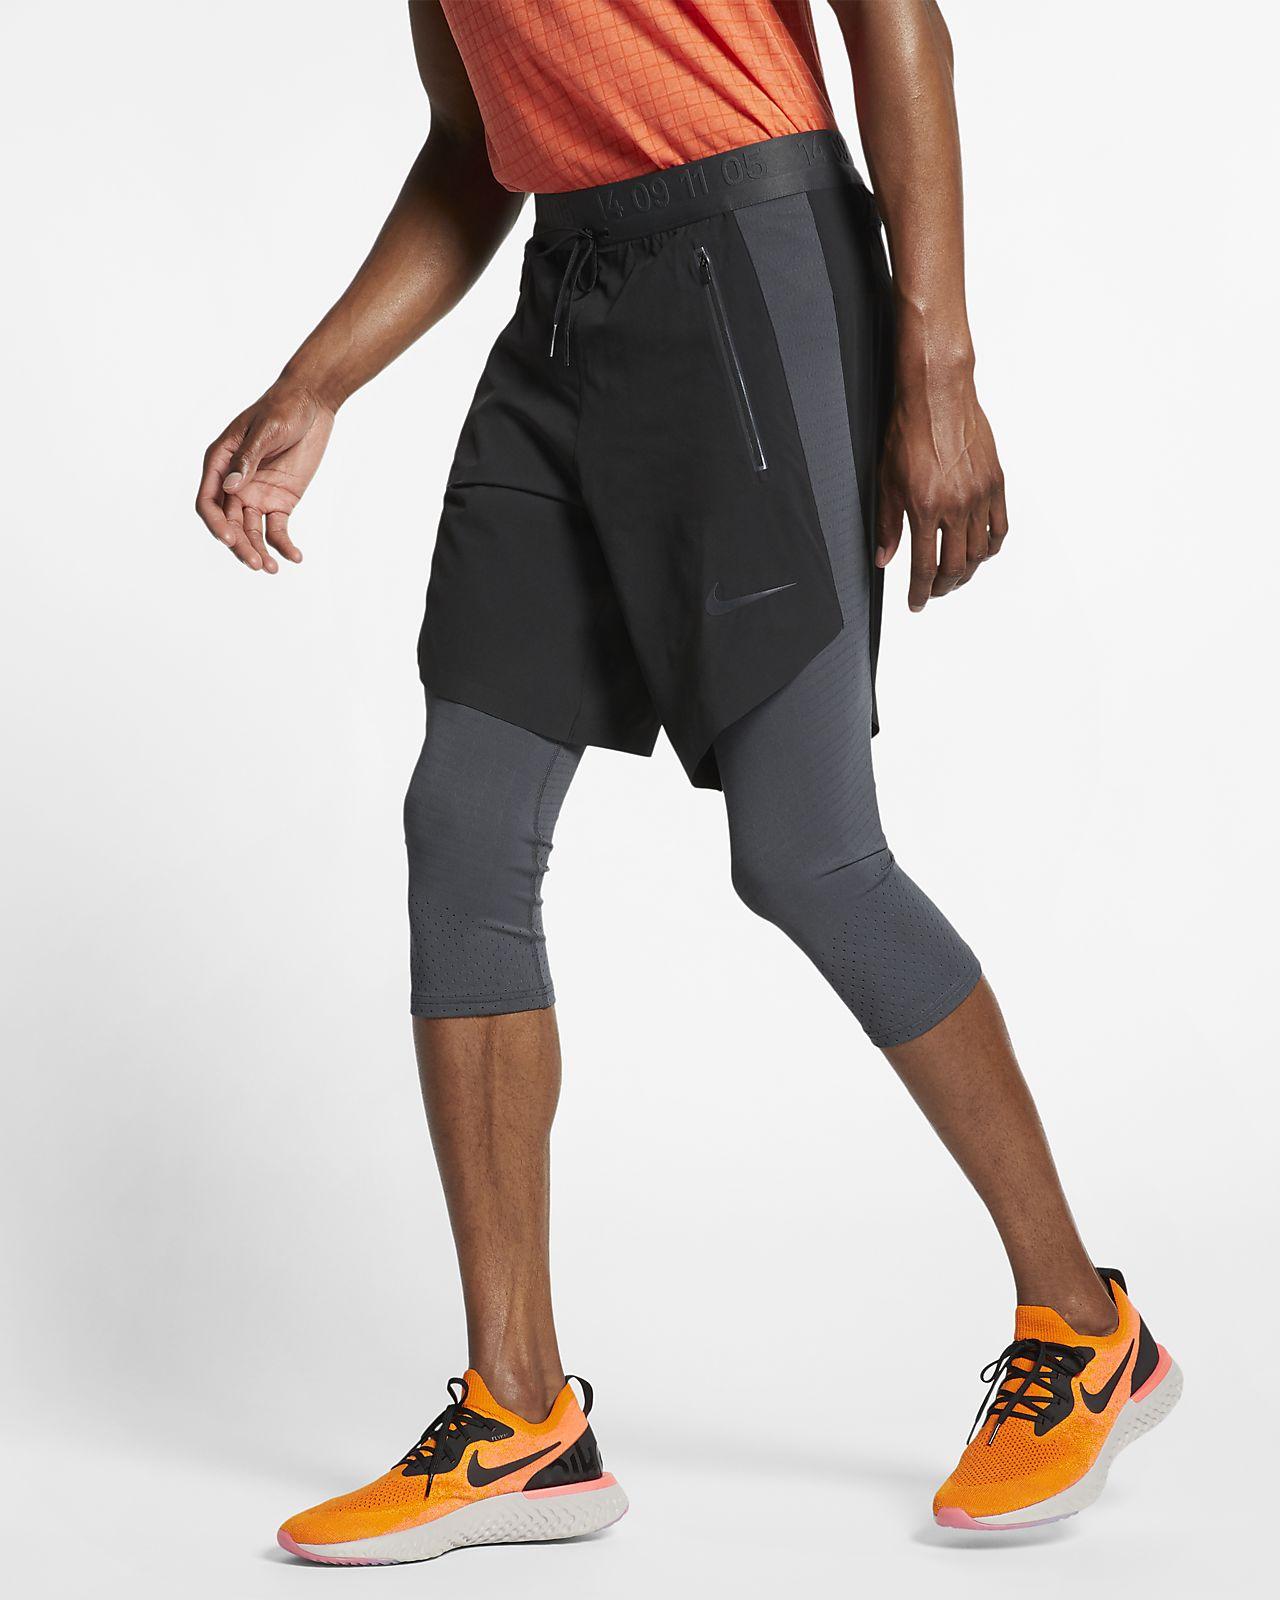 Nike Tech Pack 34 Laufhose für Herren